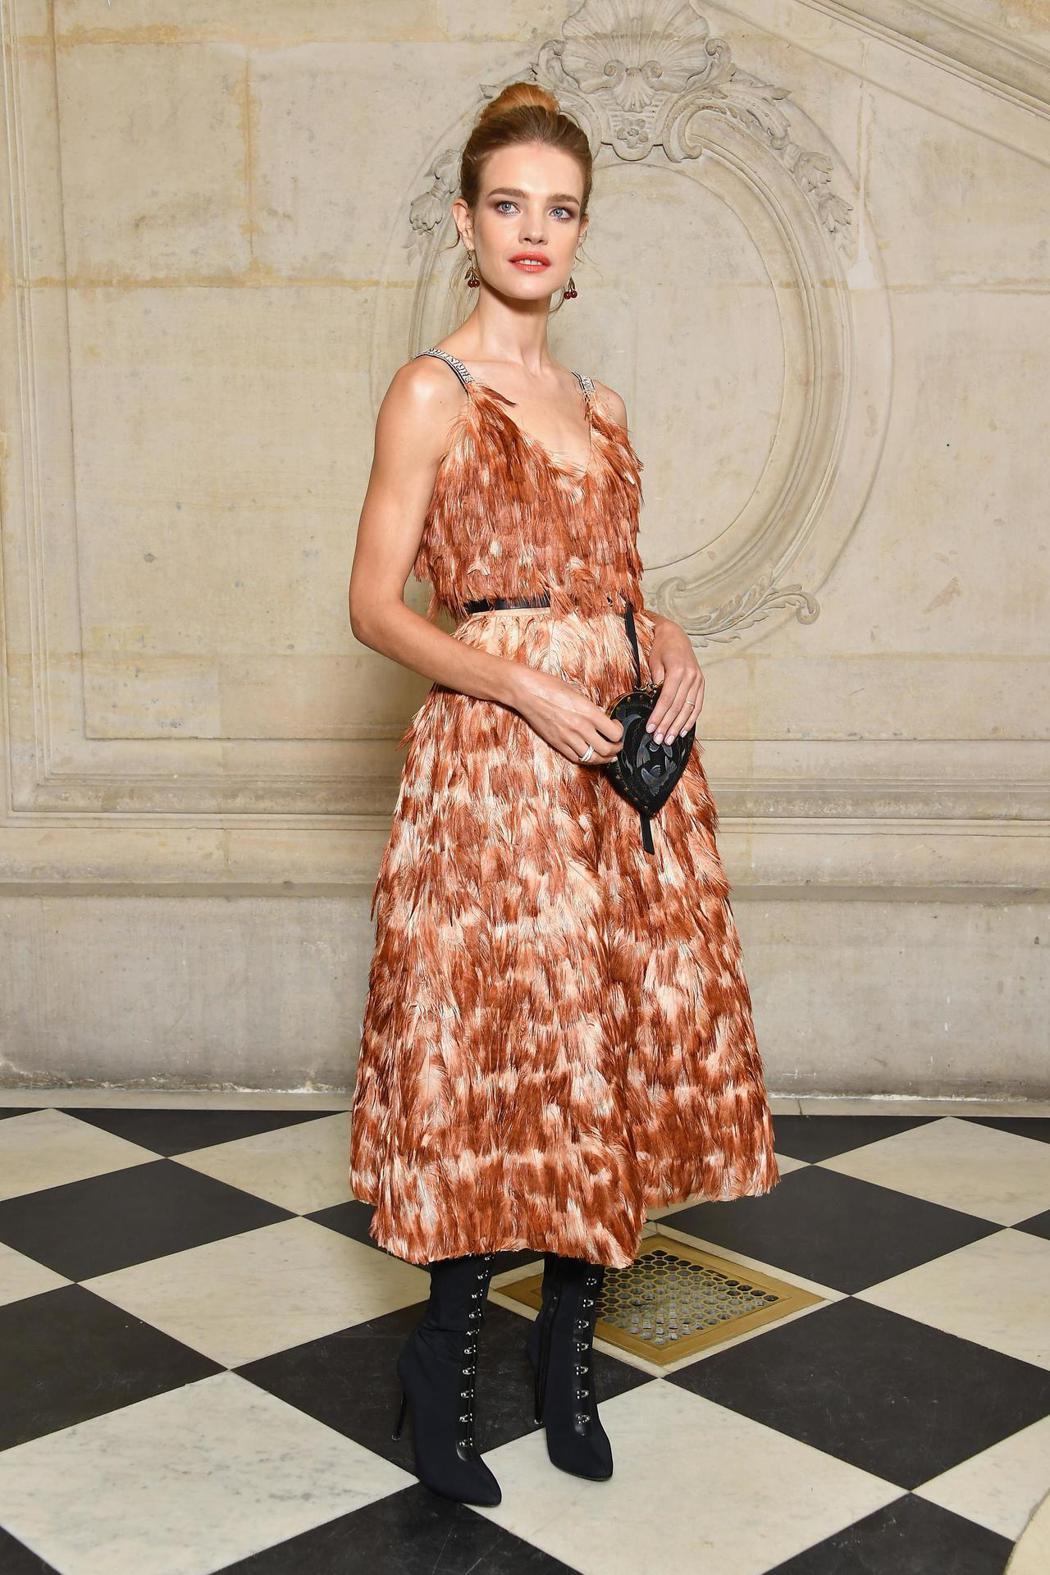 LVMH集團準媳婦、超模Natalia Vodianova出席Dior春夏時裝秀...